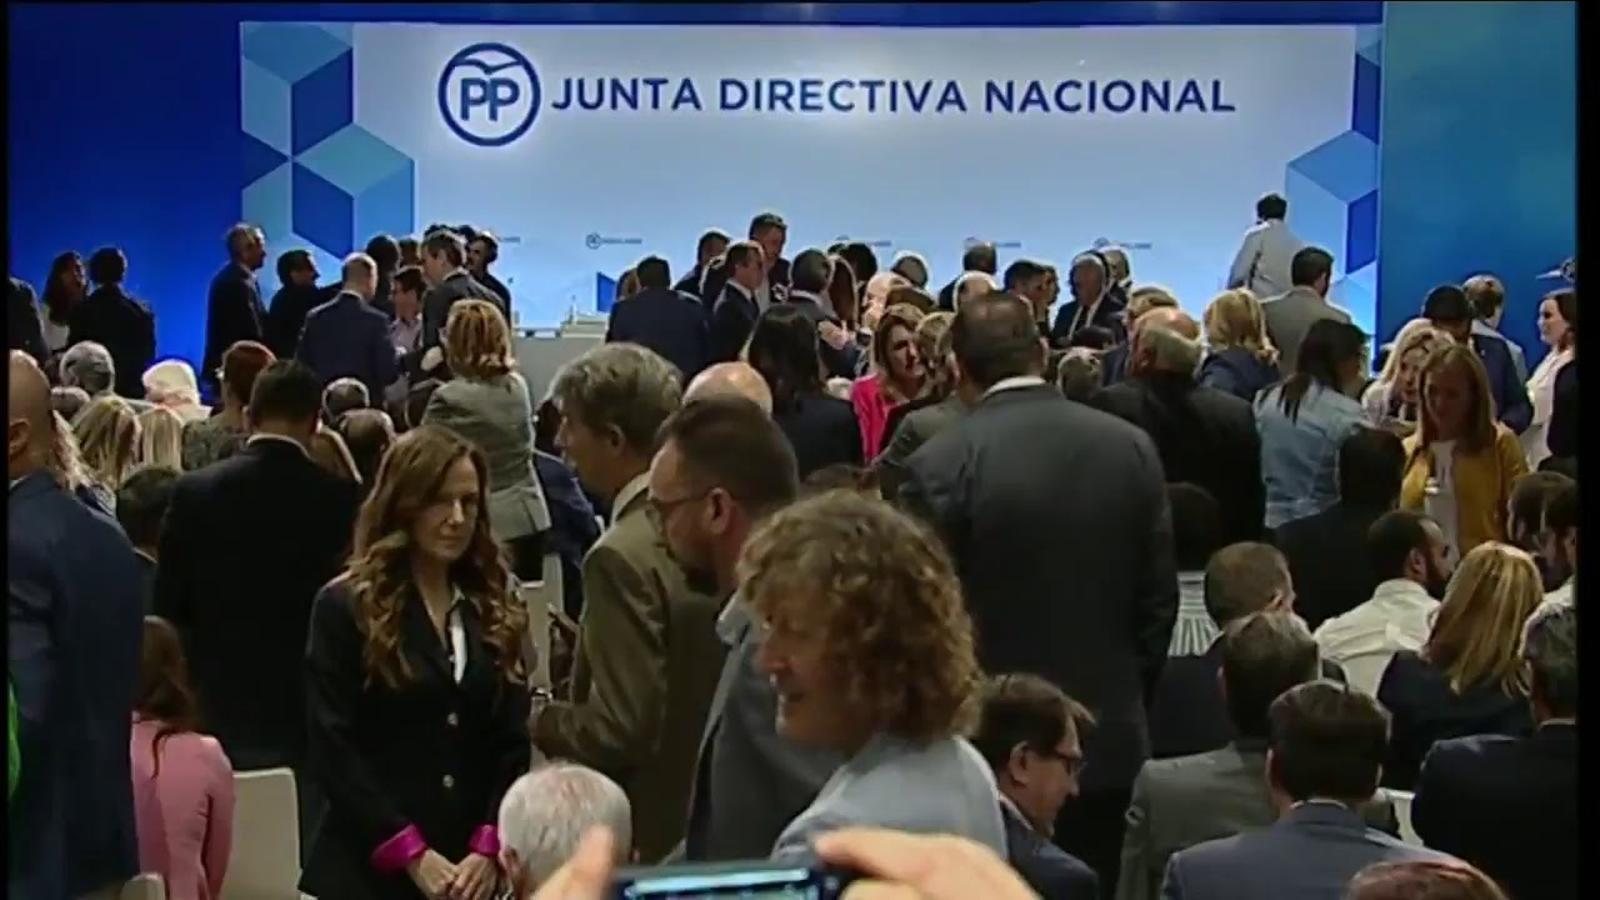 Mariano Rajoy presideix la junta directiva nacional del PP